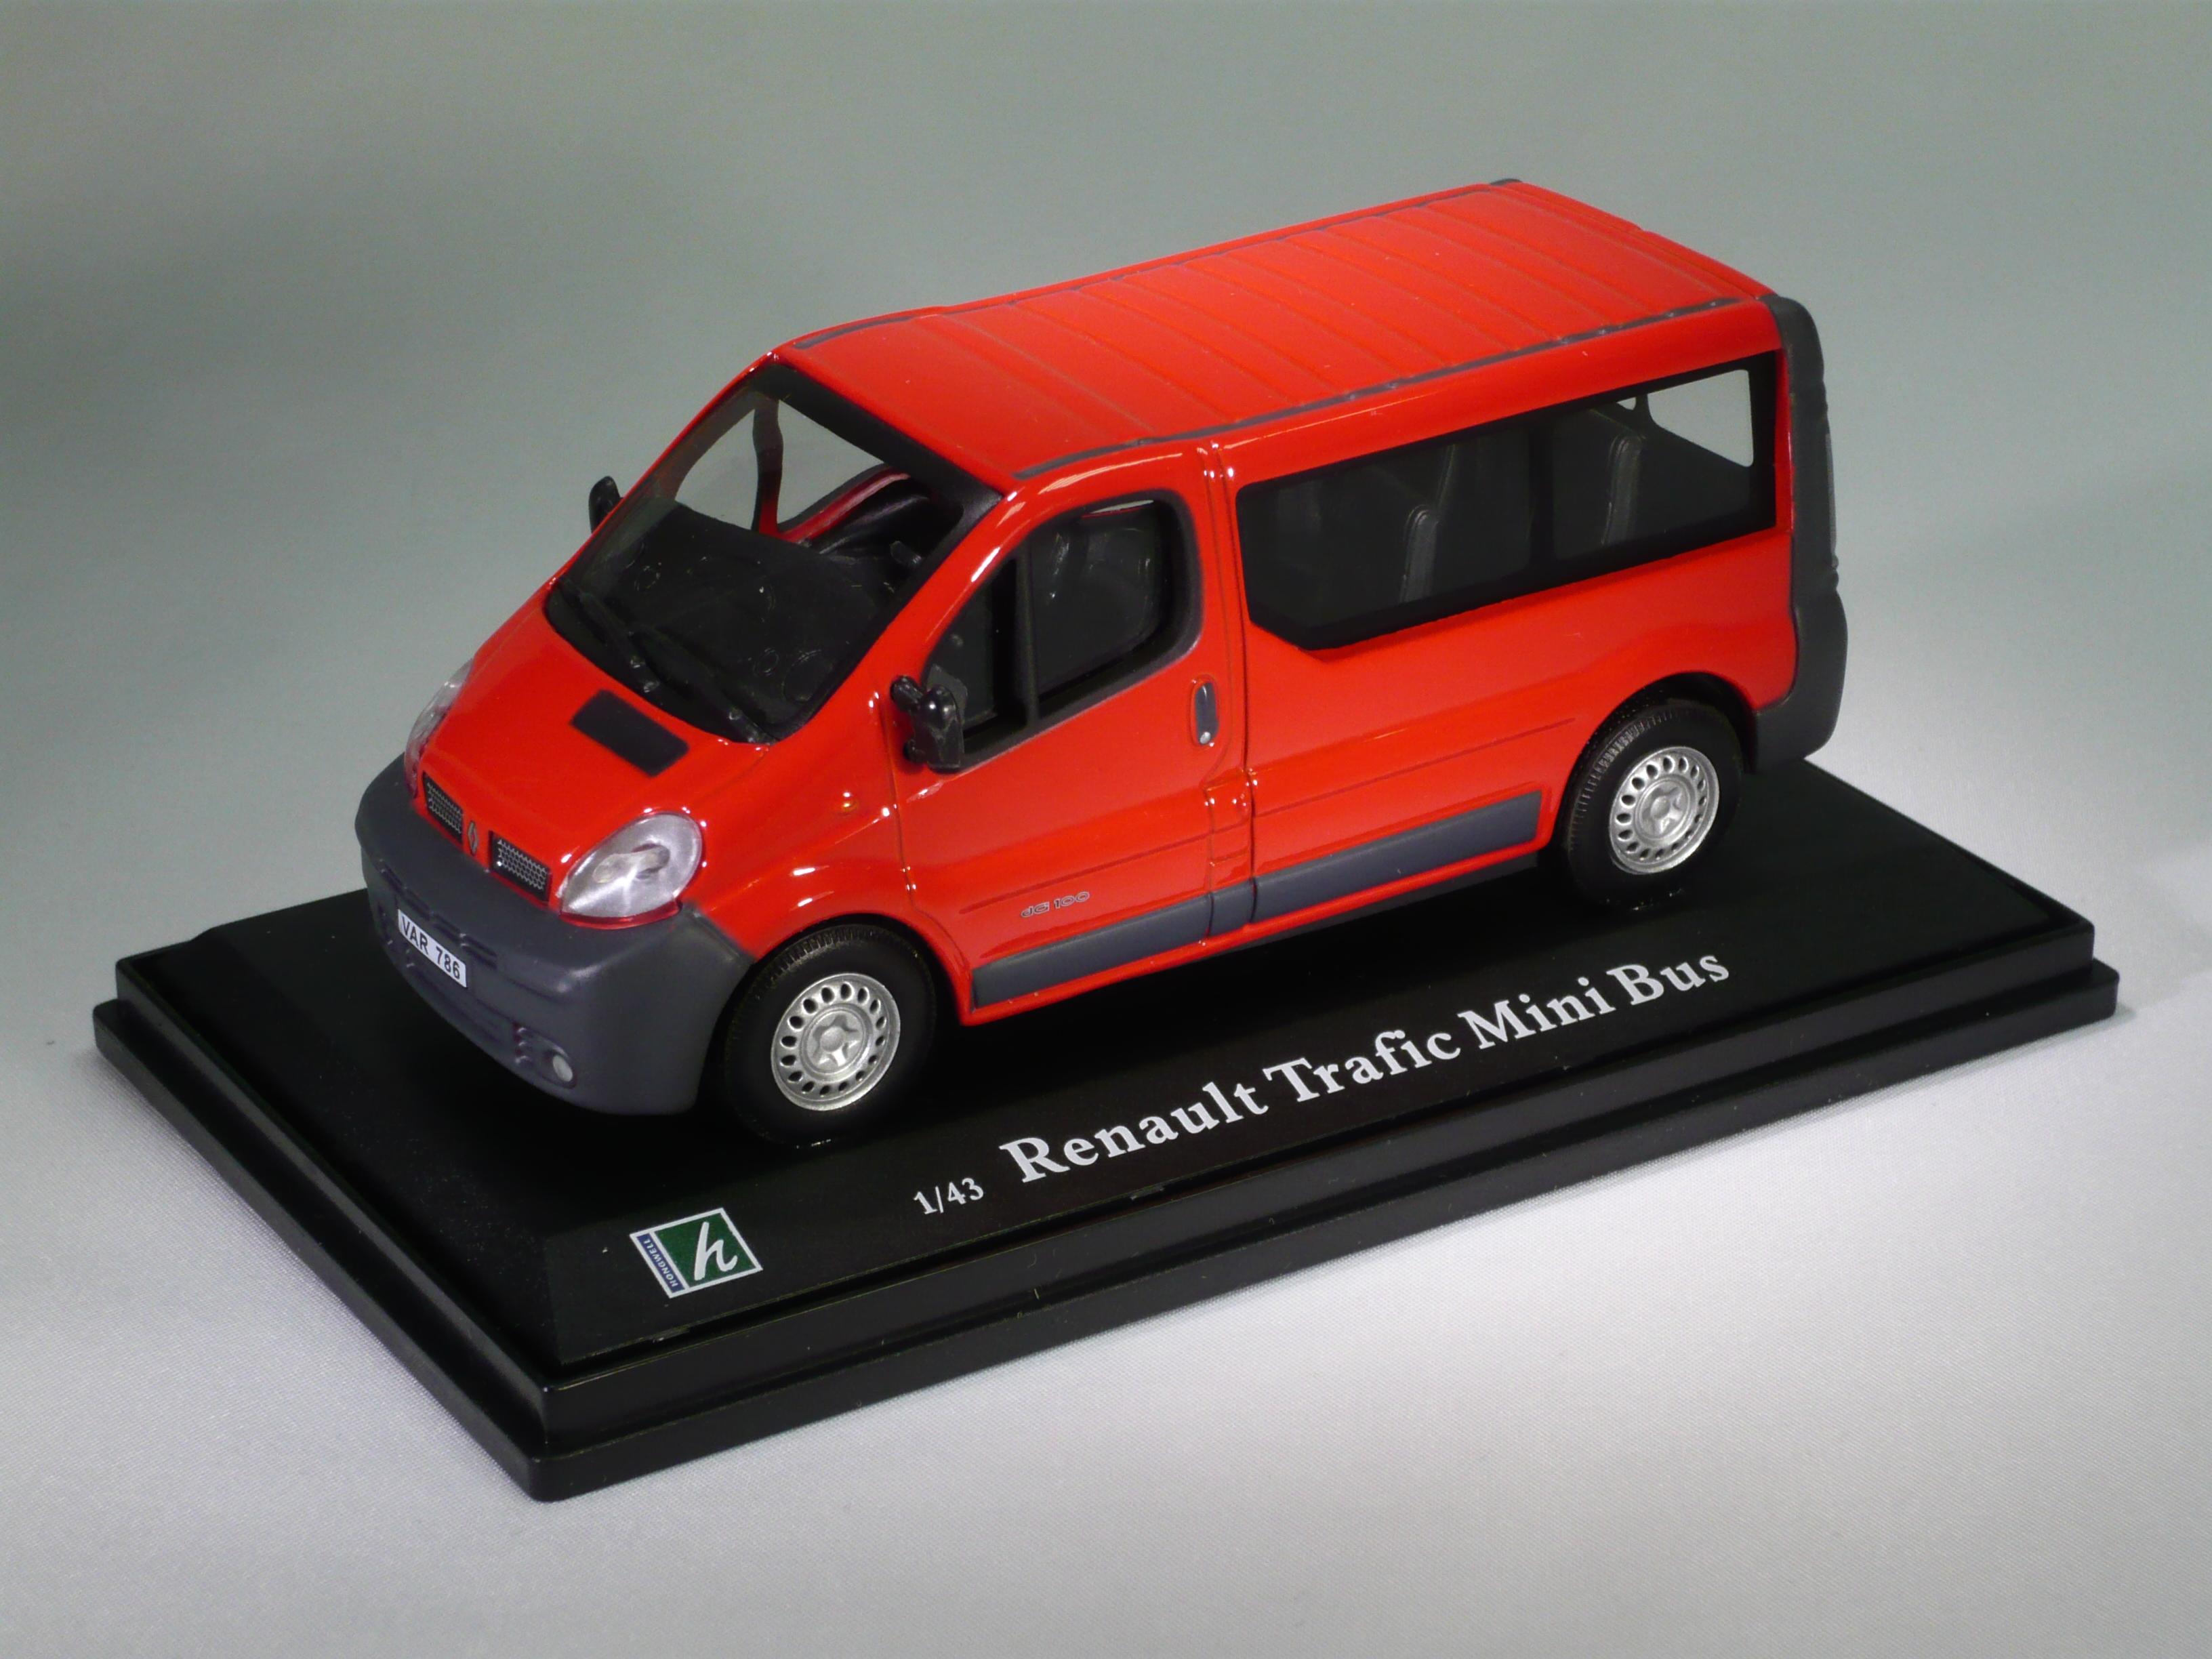 renault trafic mini bus. Black Bedroom Furniture Sets. Home Design Ideas